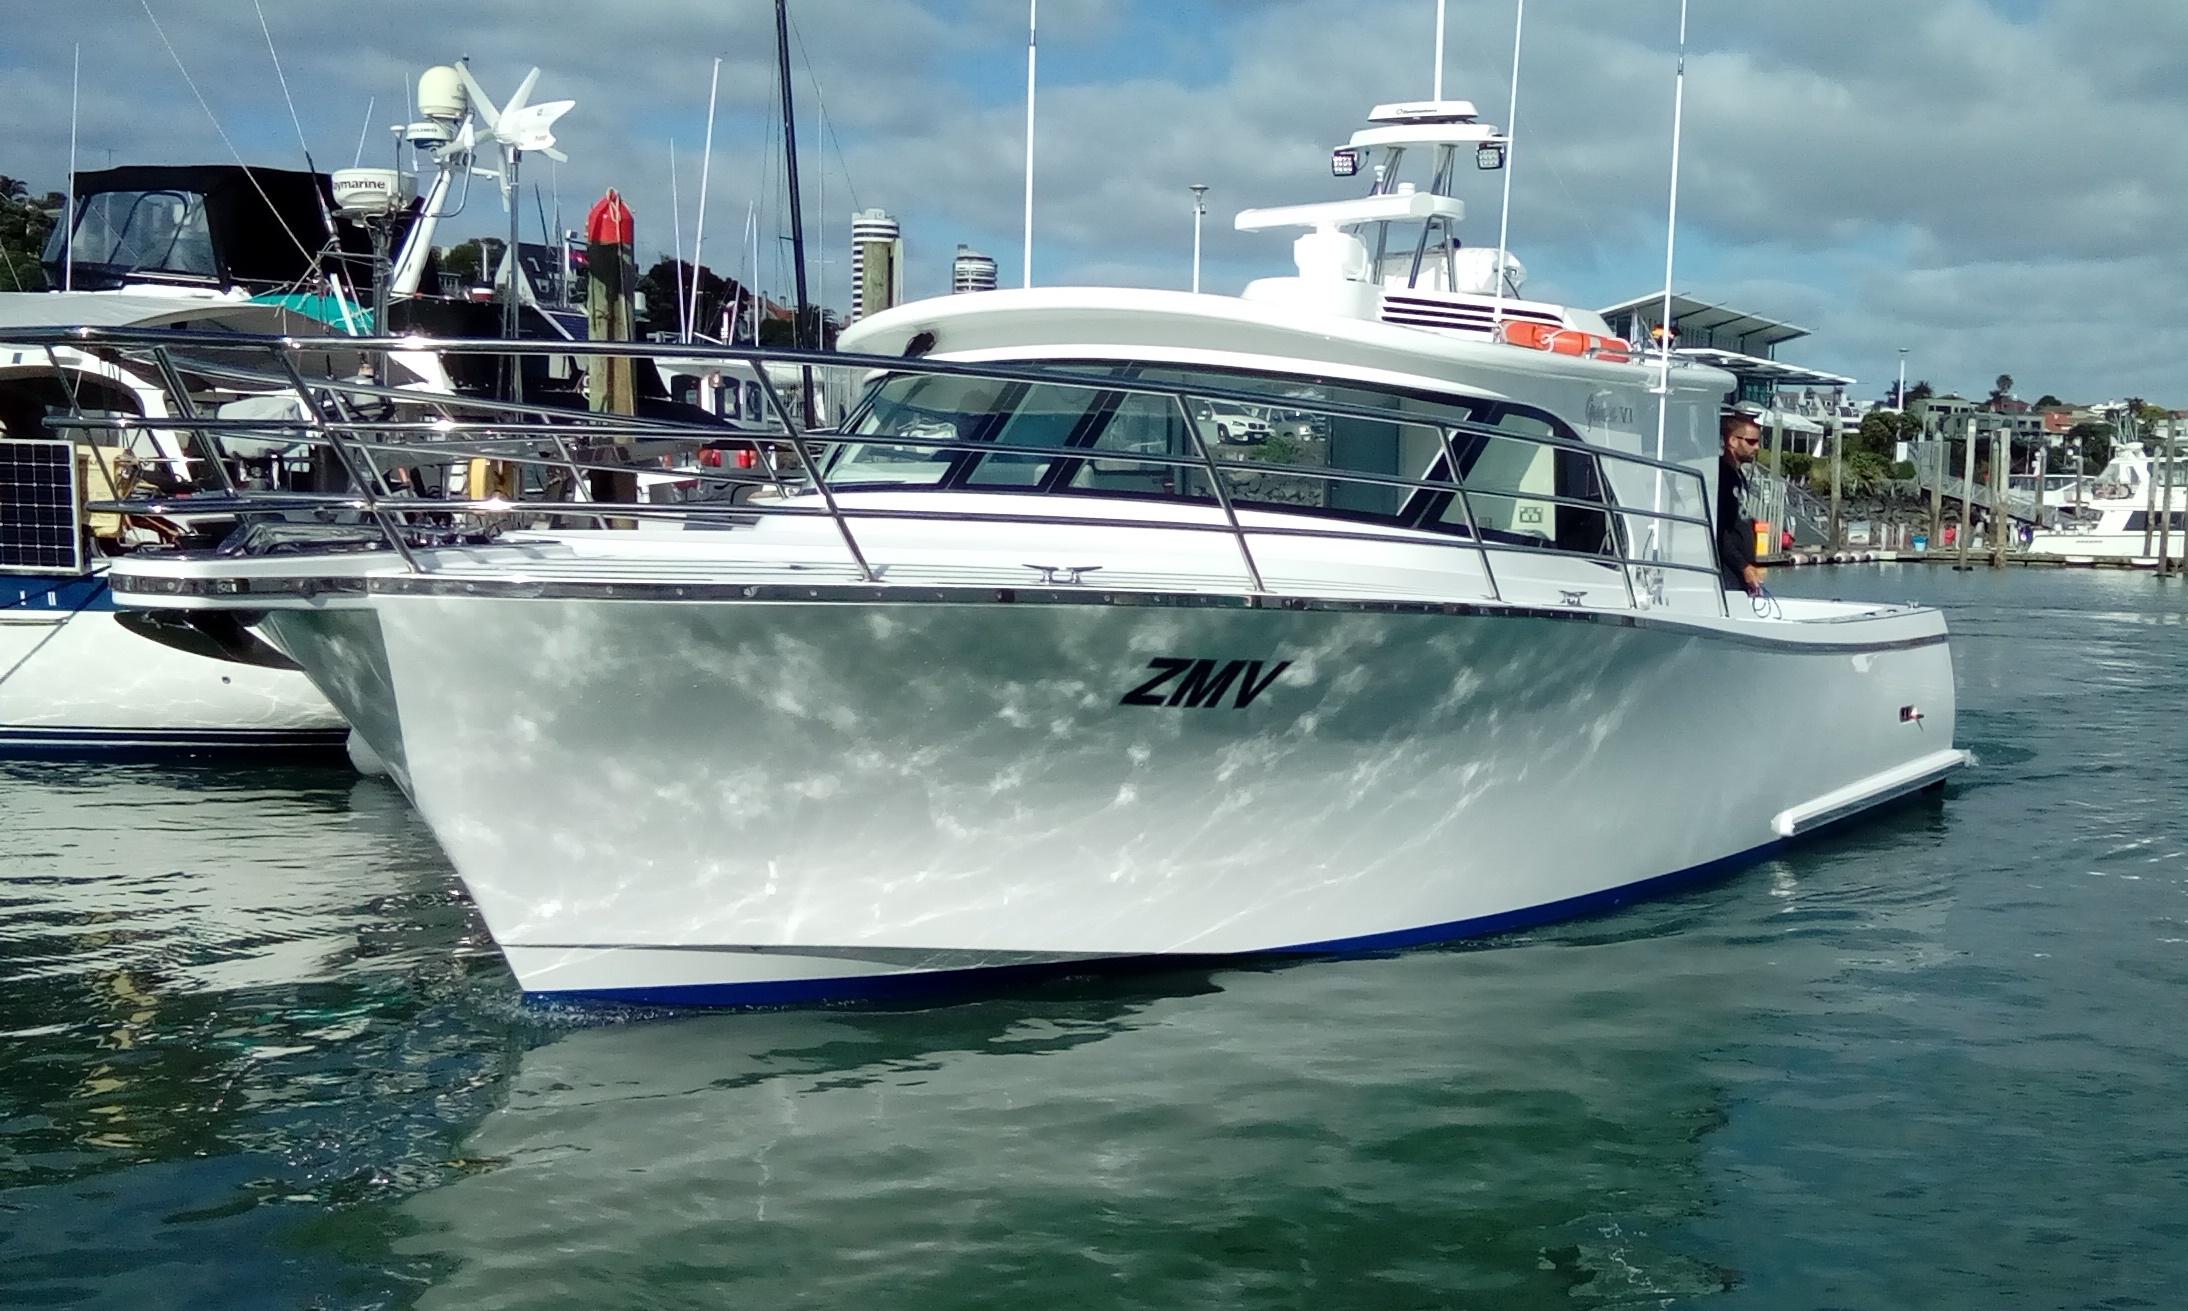 180502 40' Fishing Boat - Commercial 1.JPG